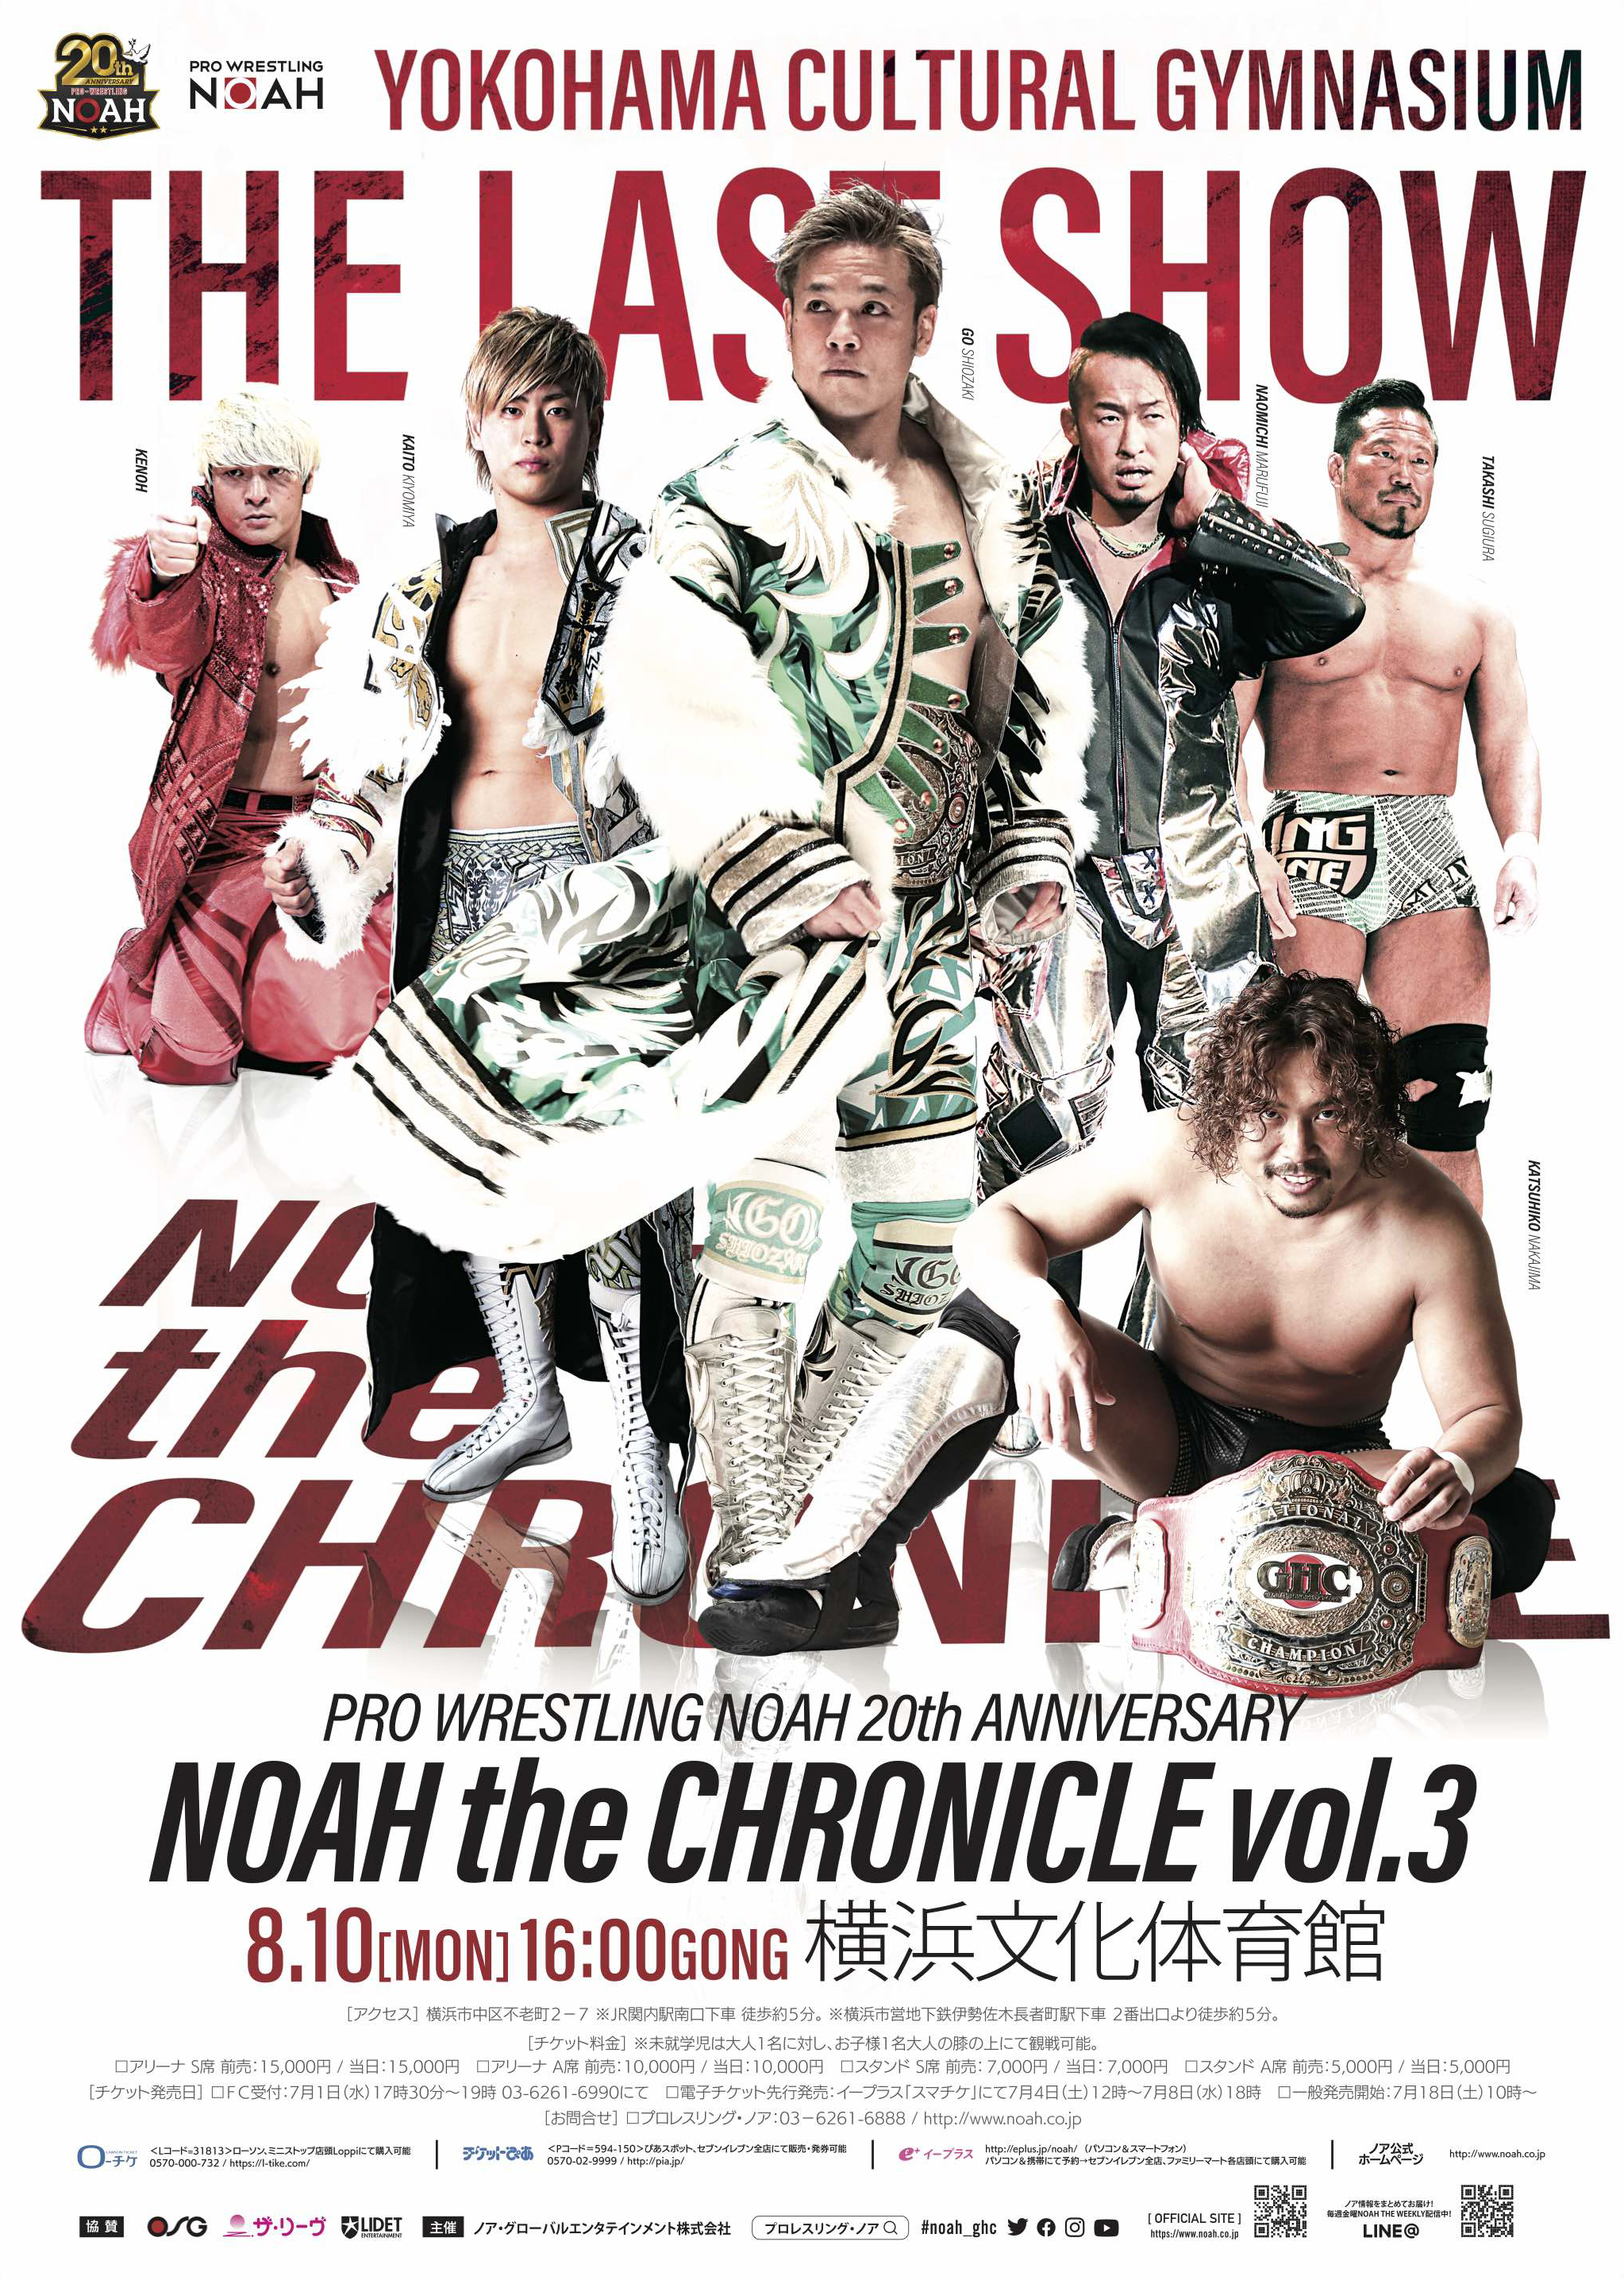 NOAH The Chronicle Vol. 3